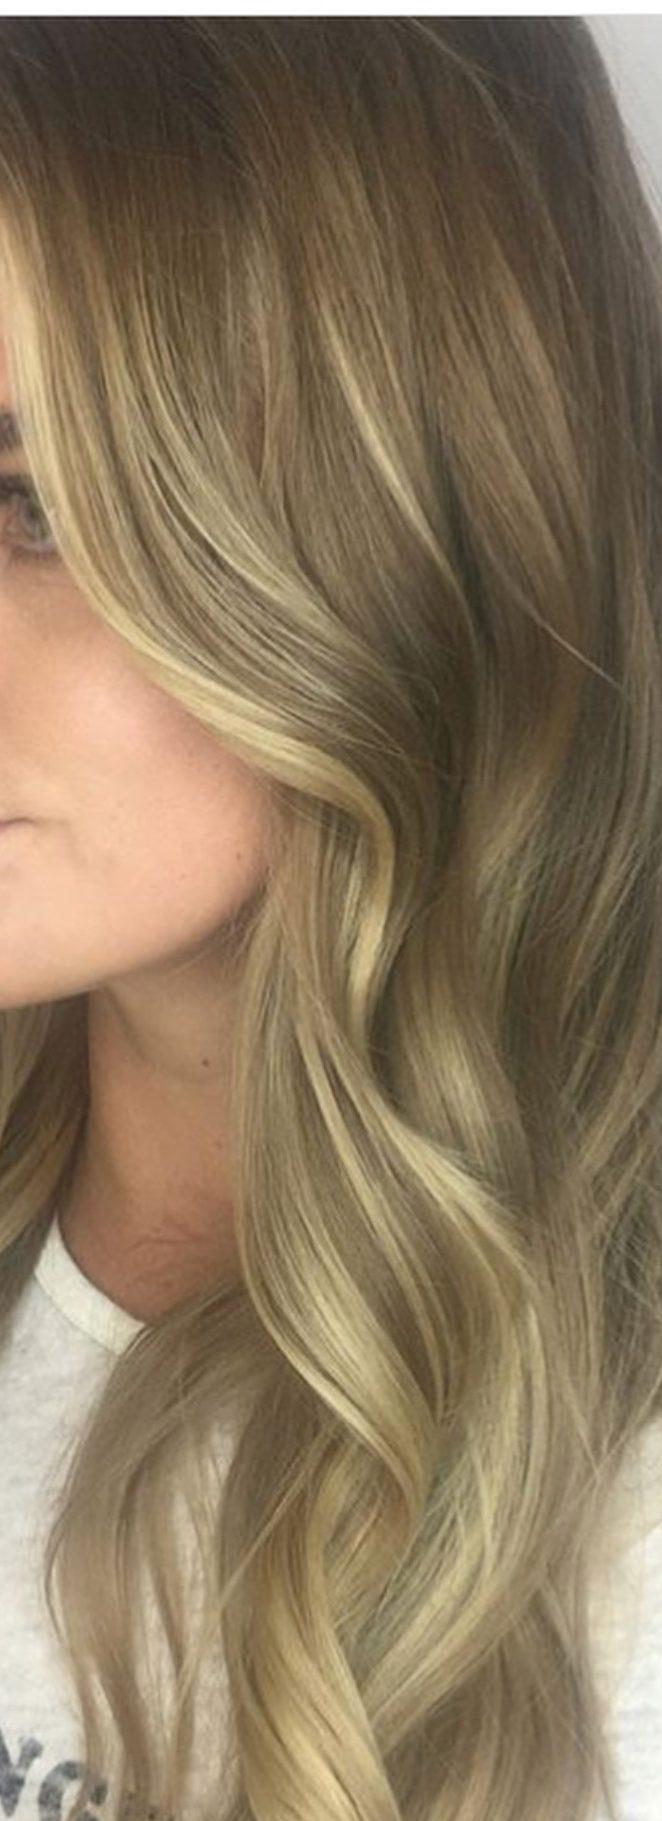 babylights hair contouring kapper amsterdam arnhem apeldoorn